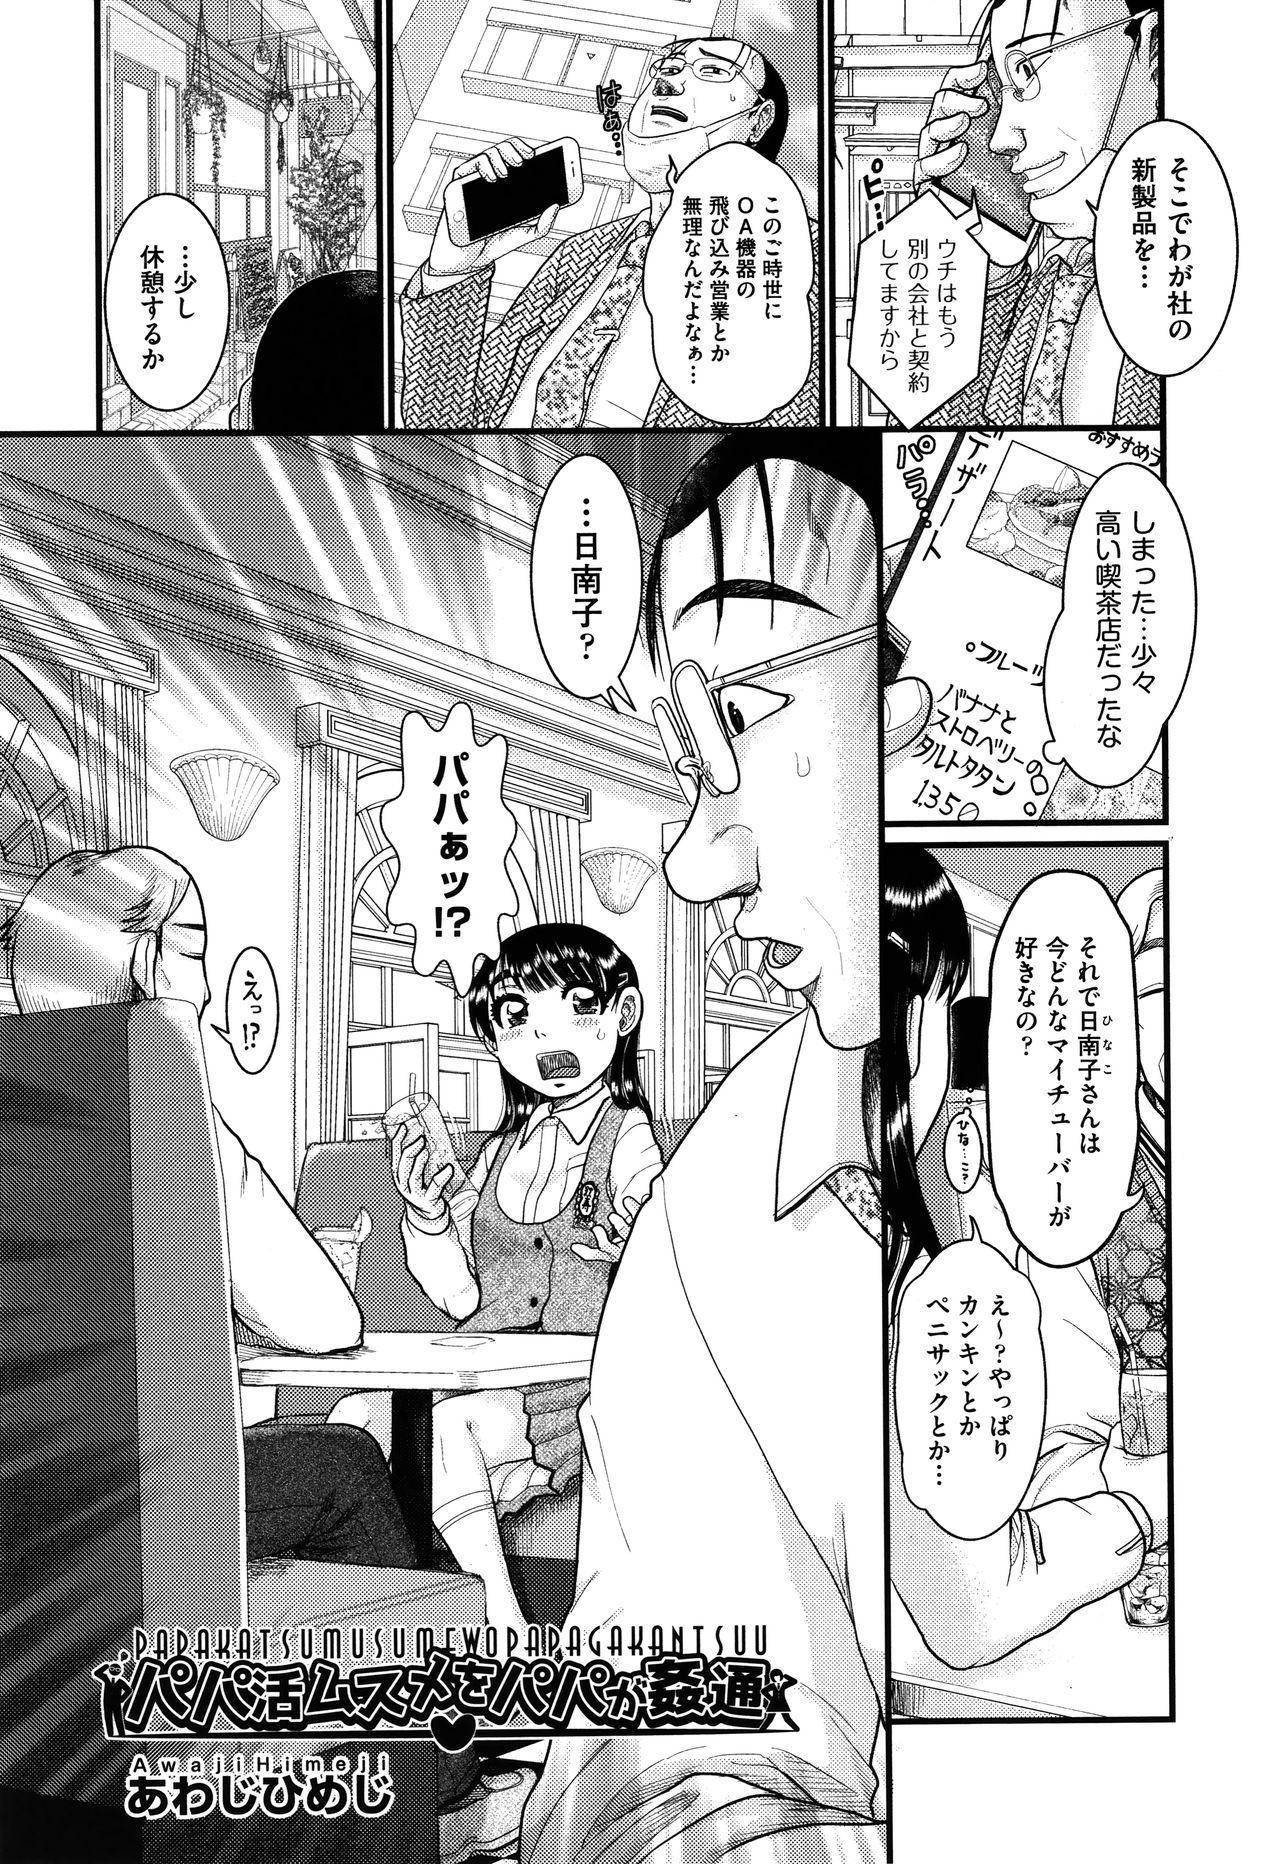 Shoujo Kumikyoku 17 77